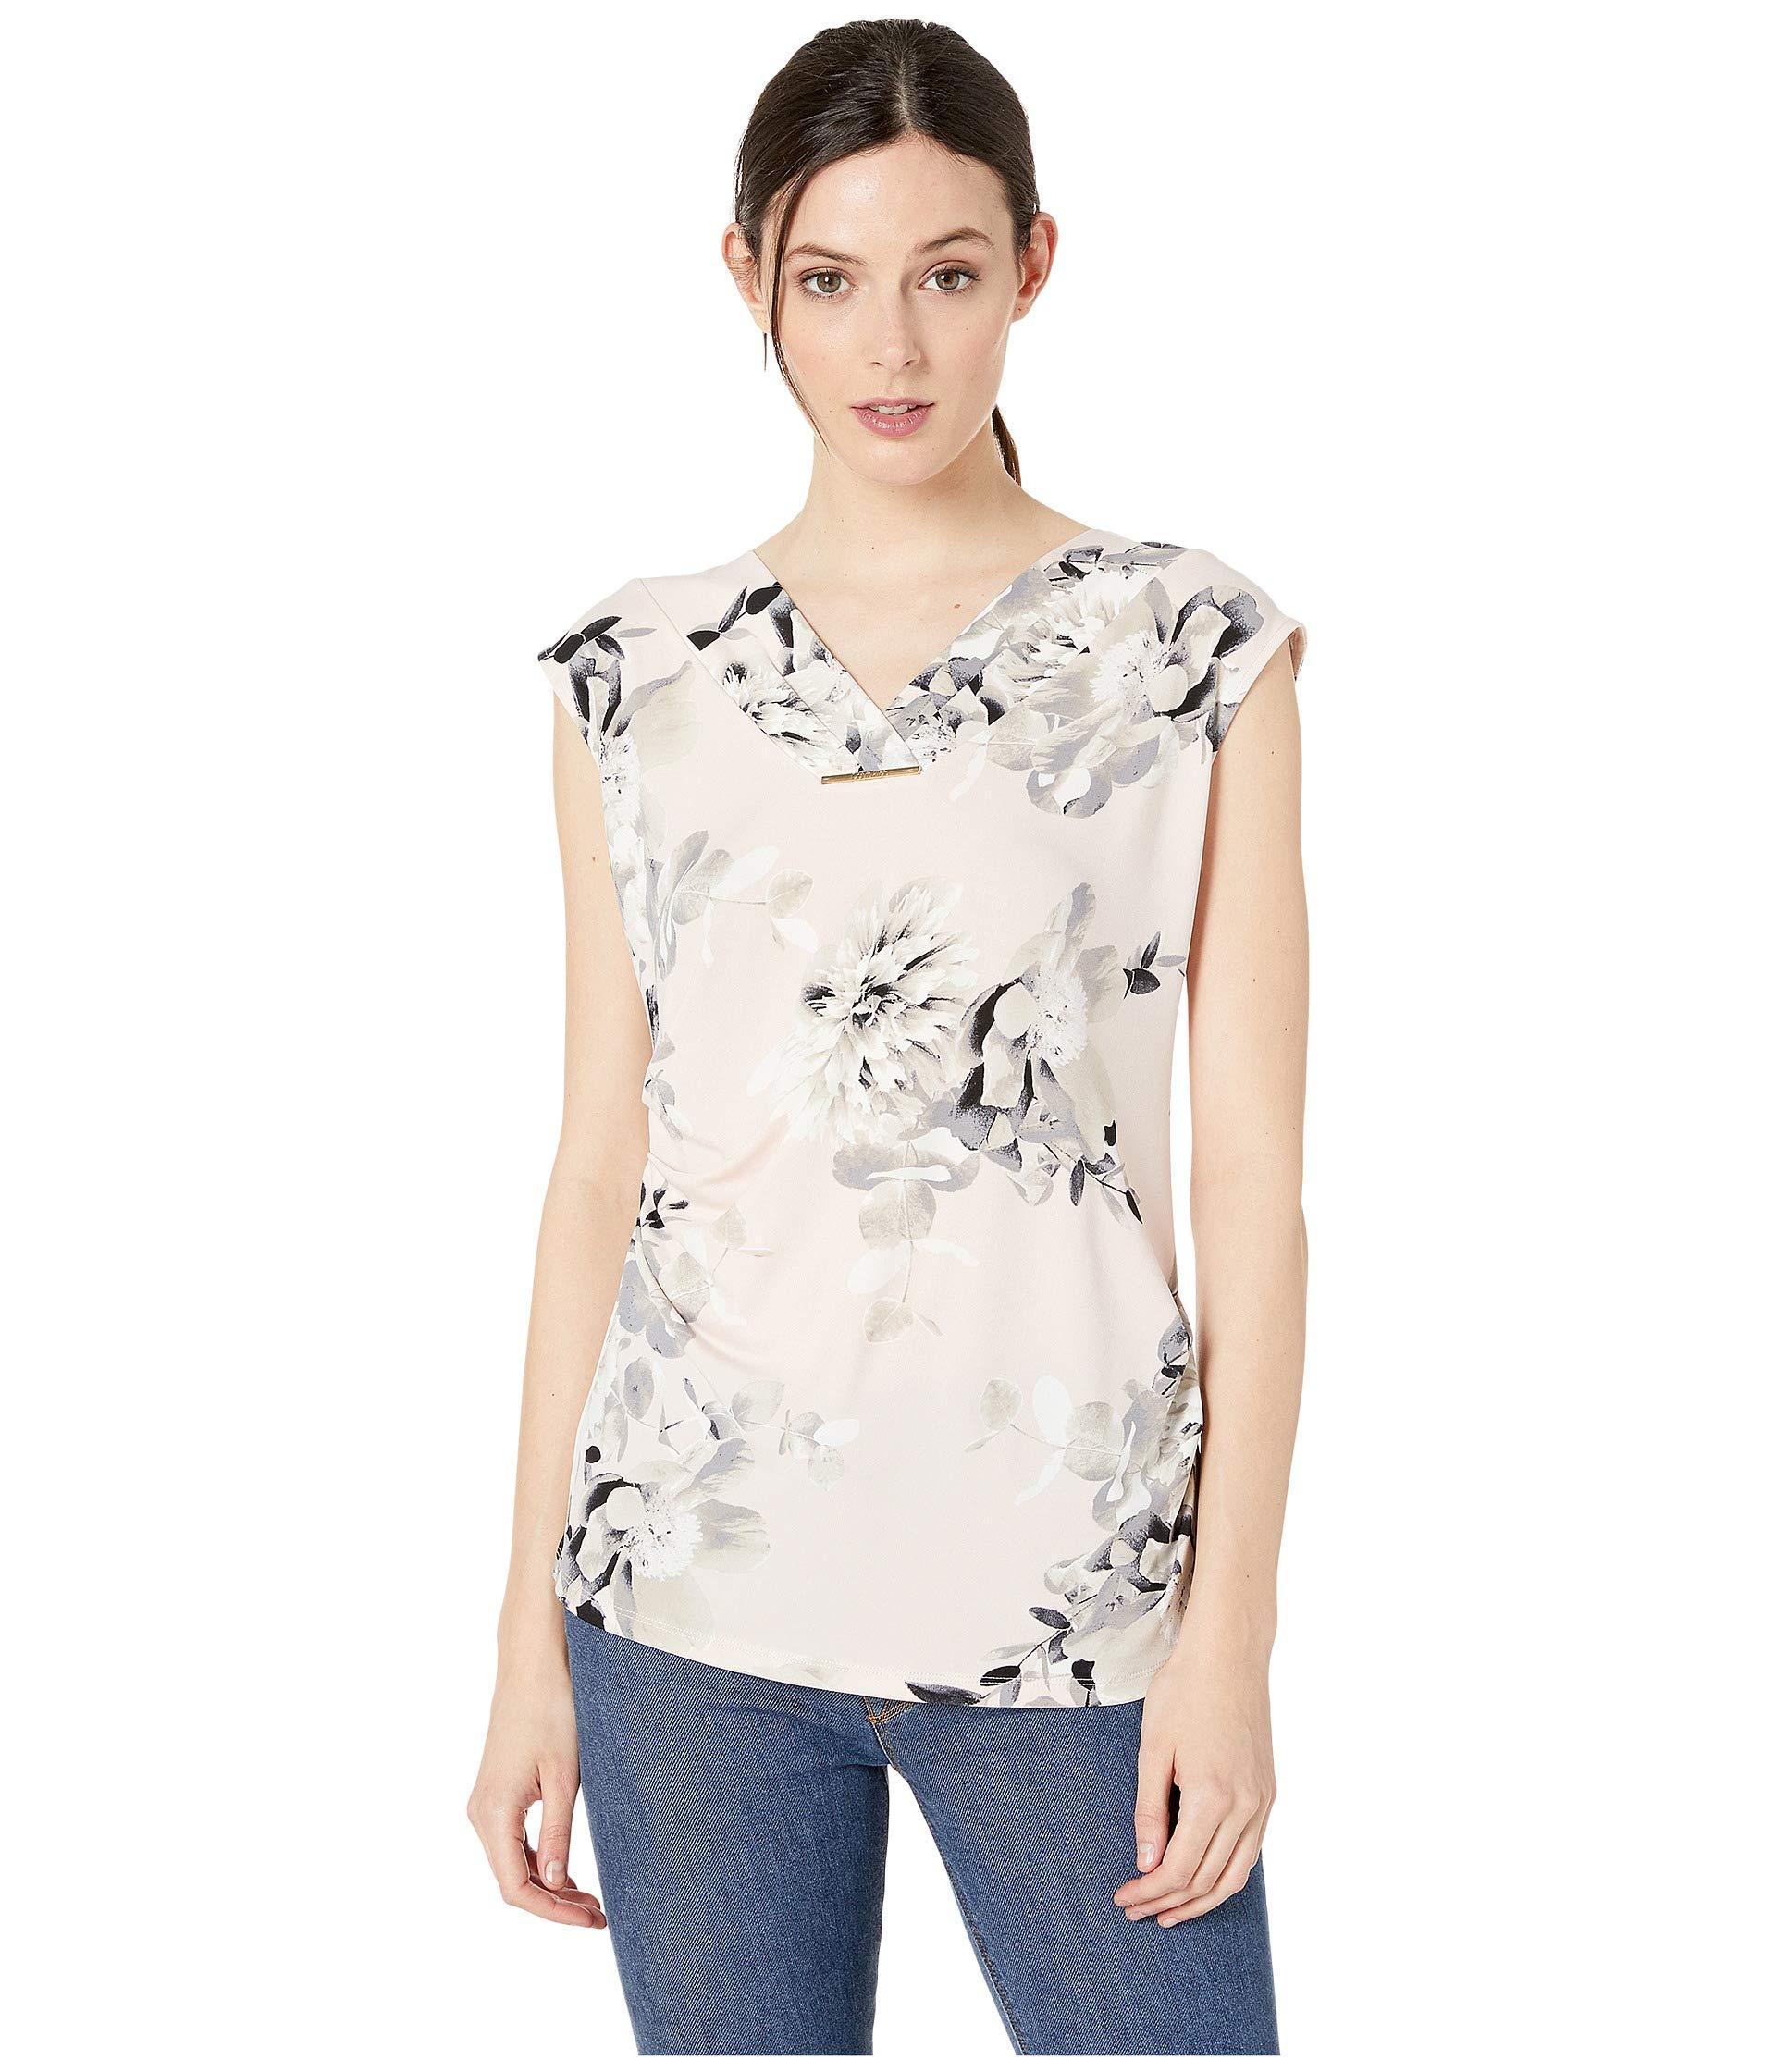 7397670c8cb698 Lyst - Calvin Klein Printed Sleeveless With Ruching And Bar (blush ...